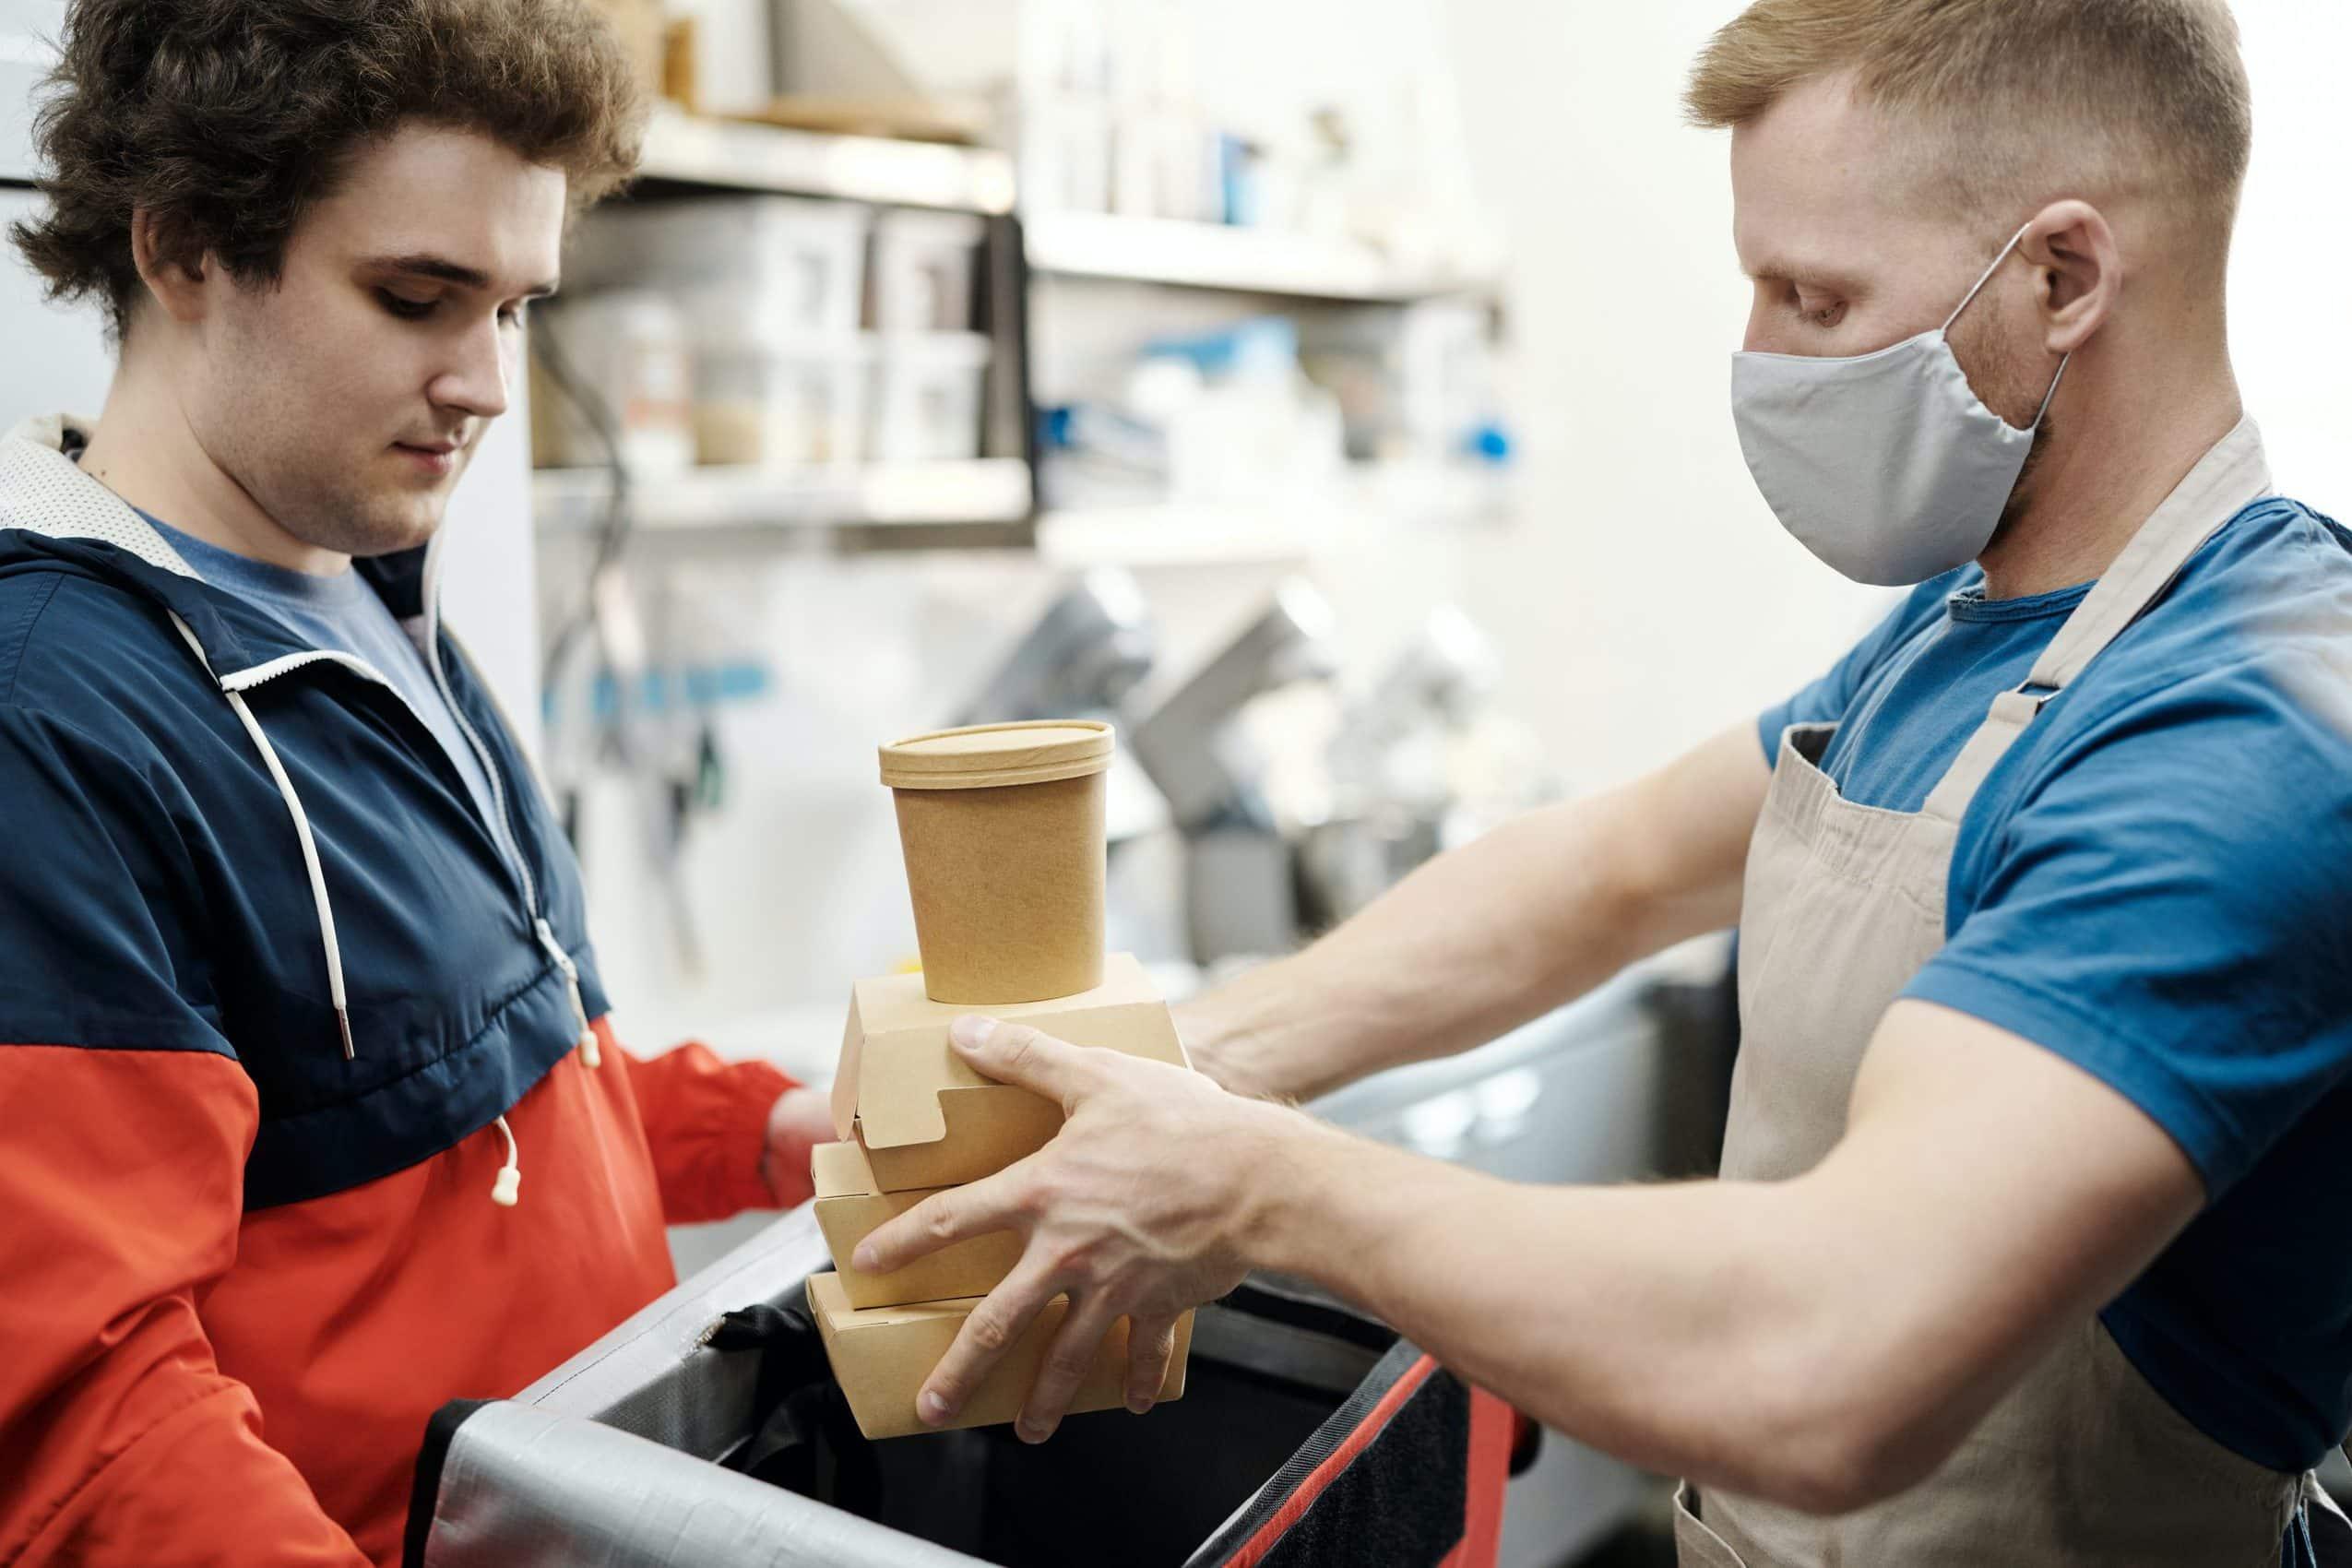 men-putting-food-on-a-thermal-bag-4393665